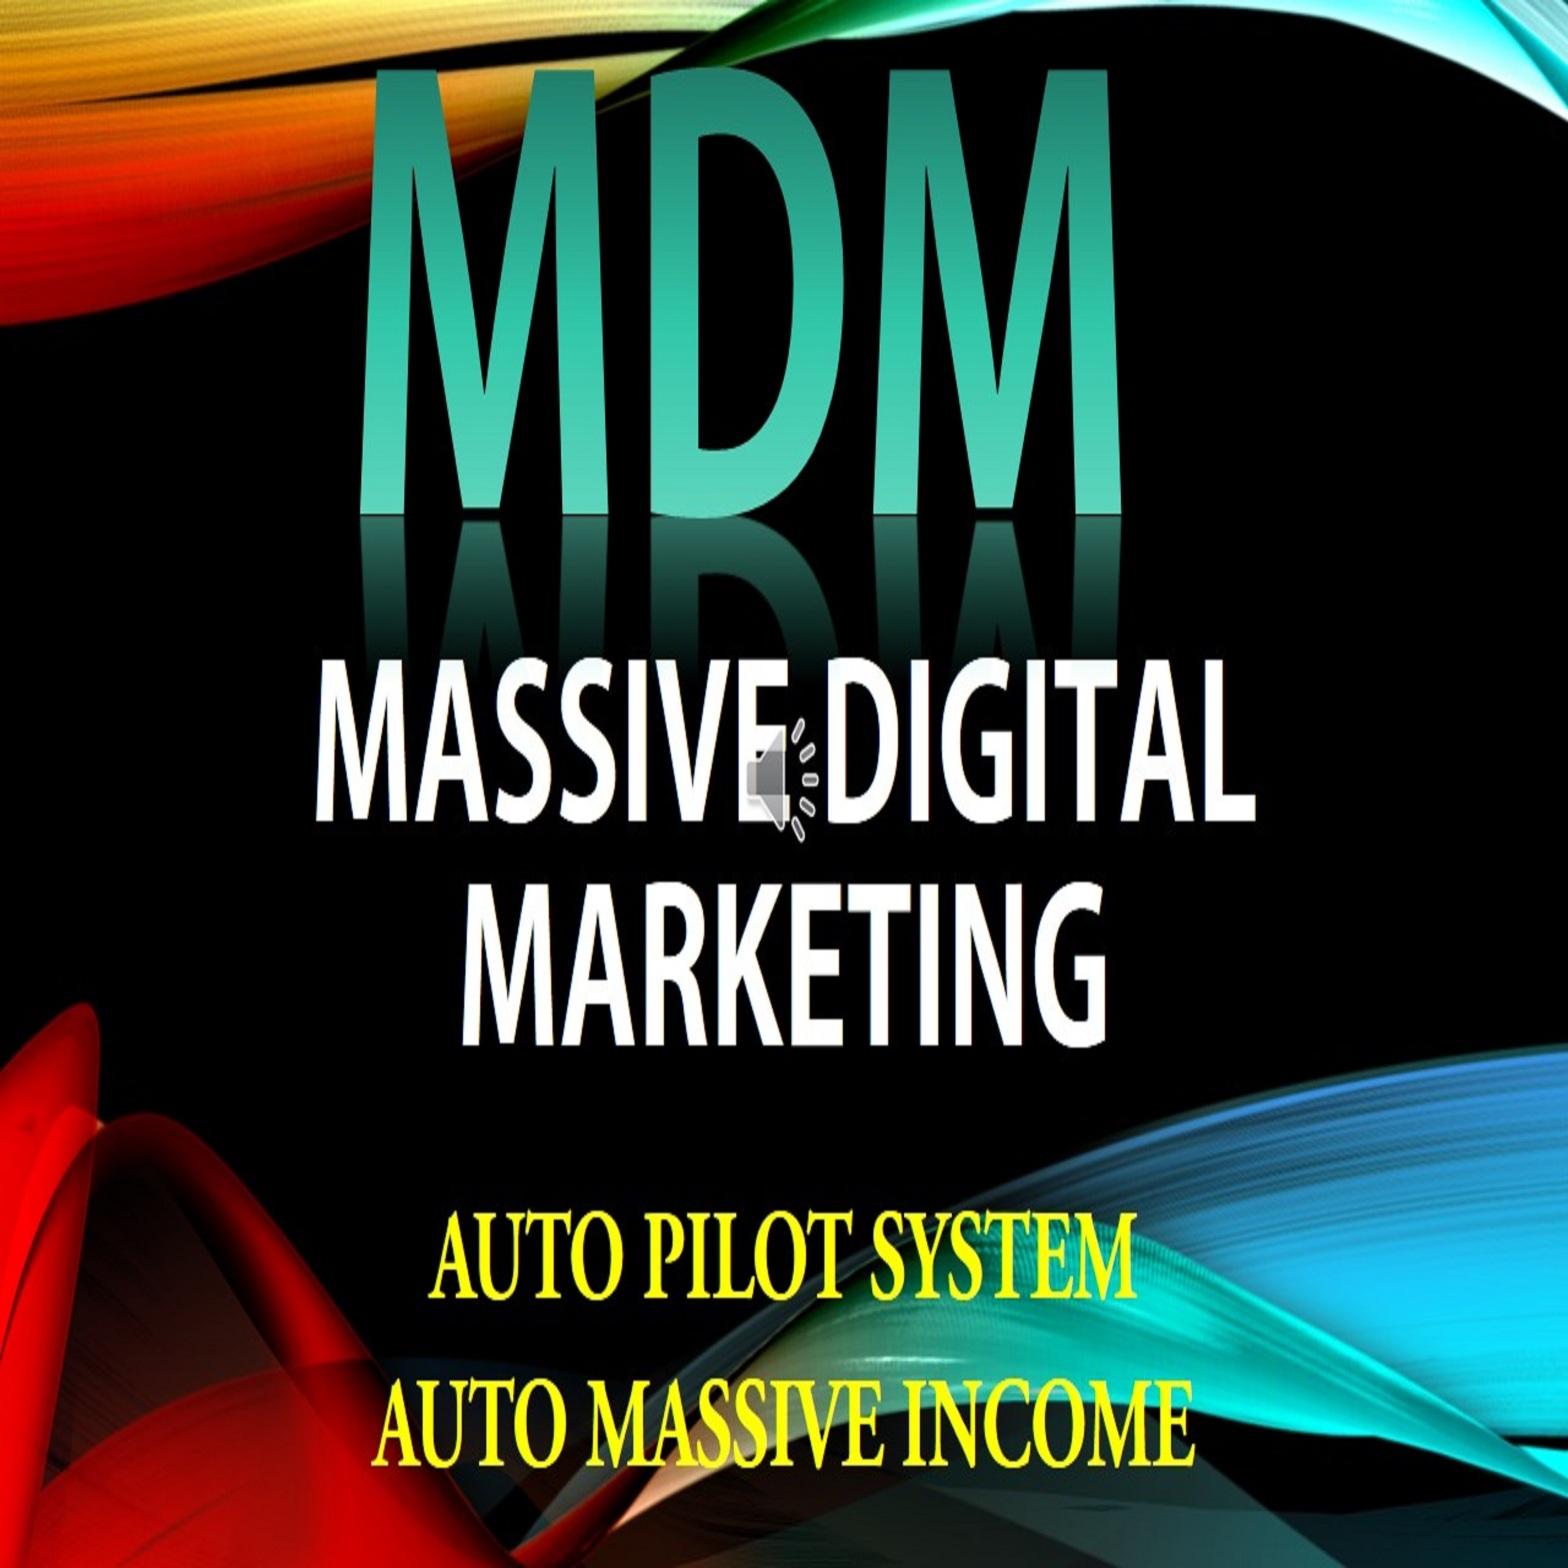 Massive Digital Marketing